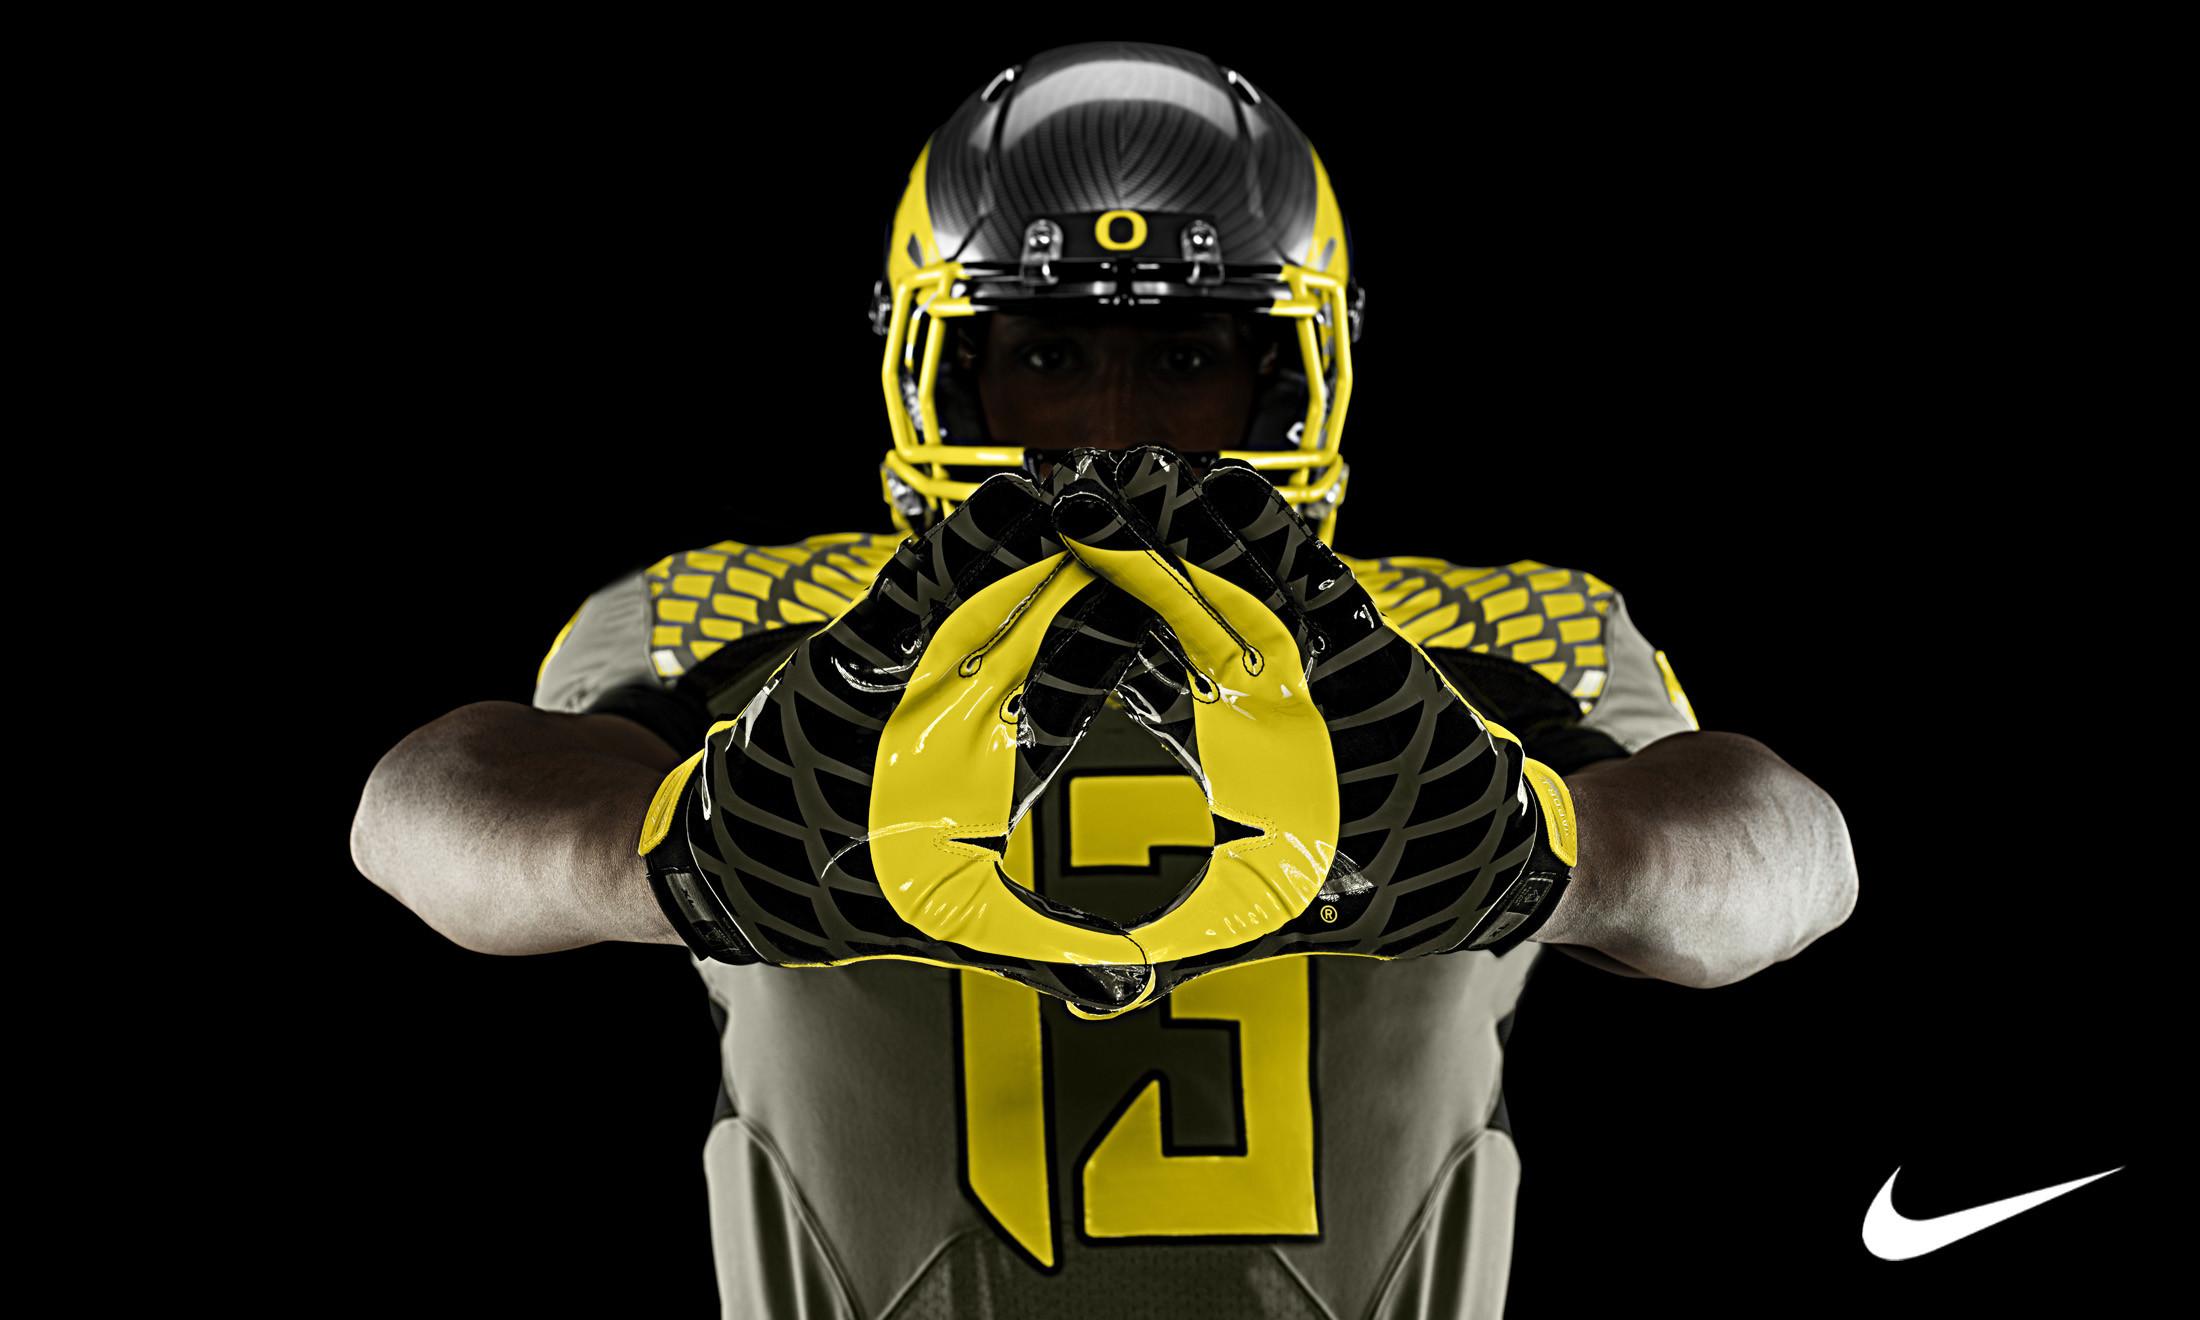 2200x1320 Wallpaperwiki Oregon College Football Px PIC